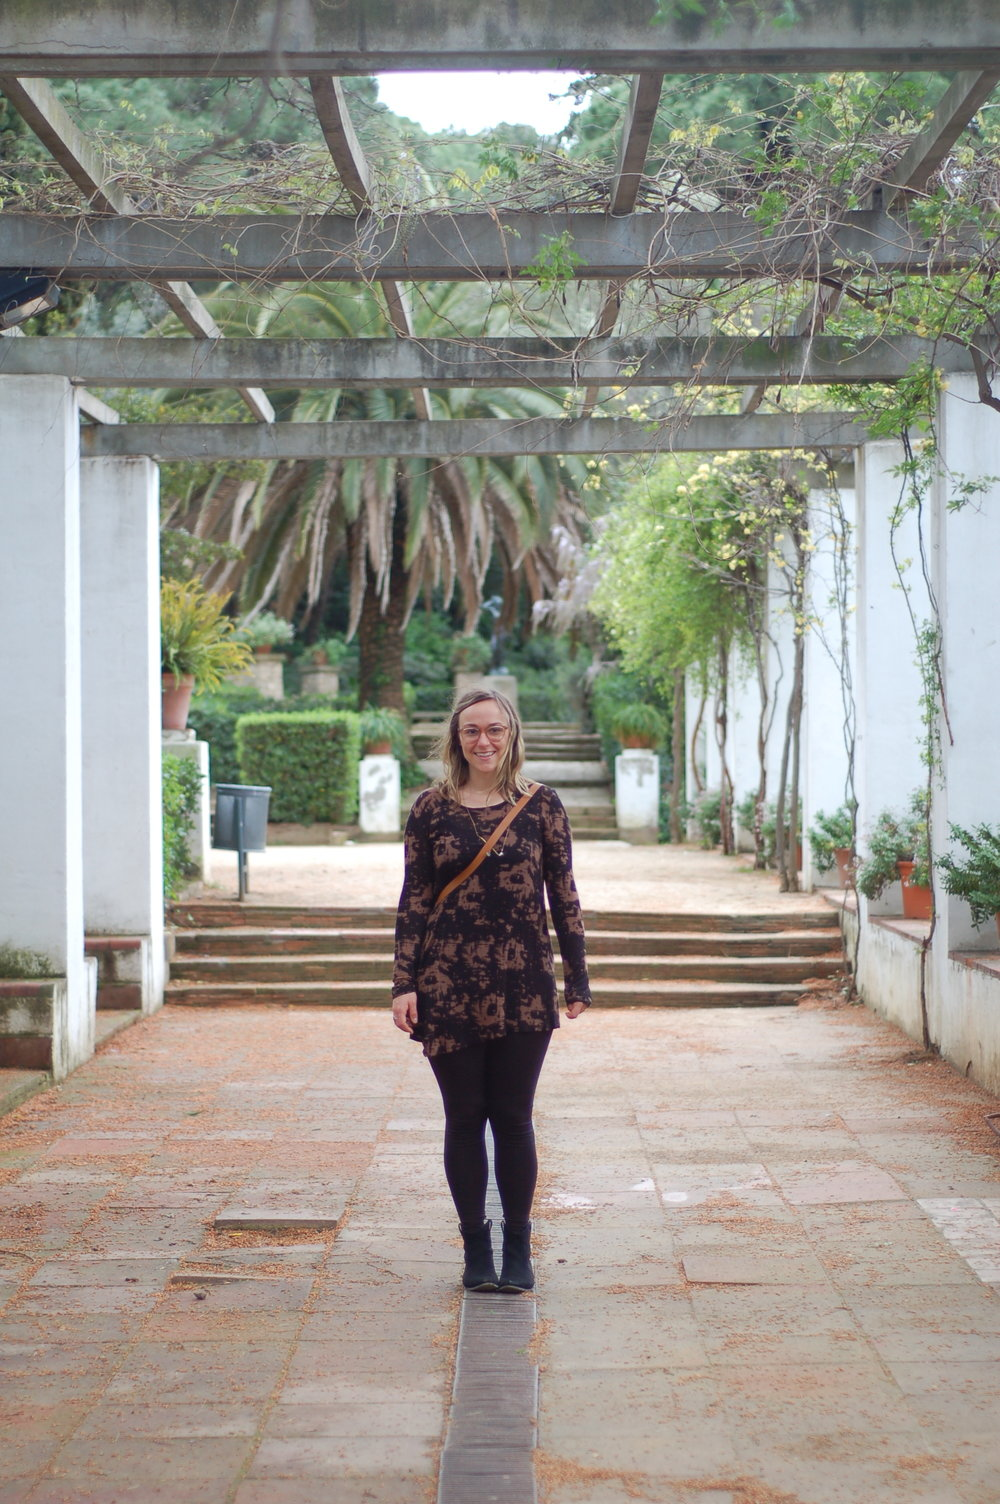 Exploring public gardens in Spain